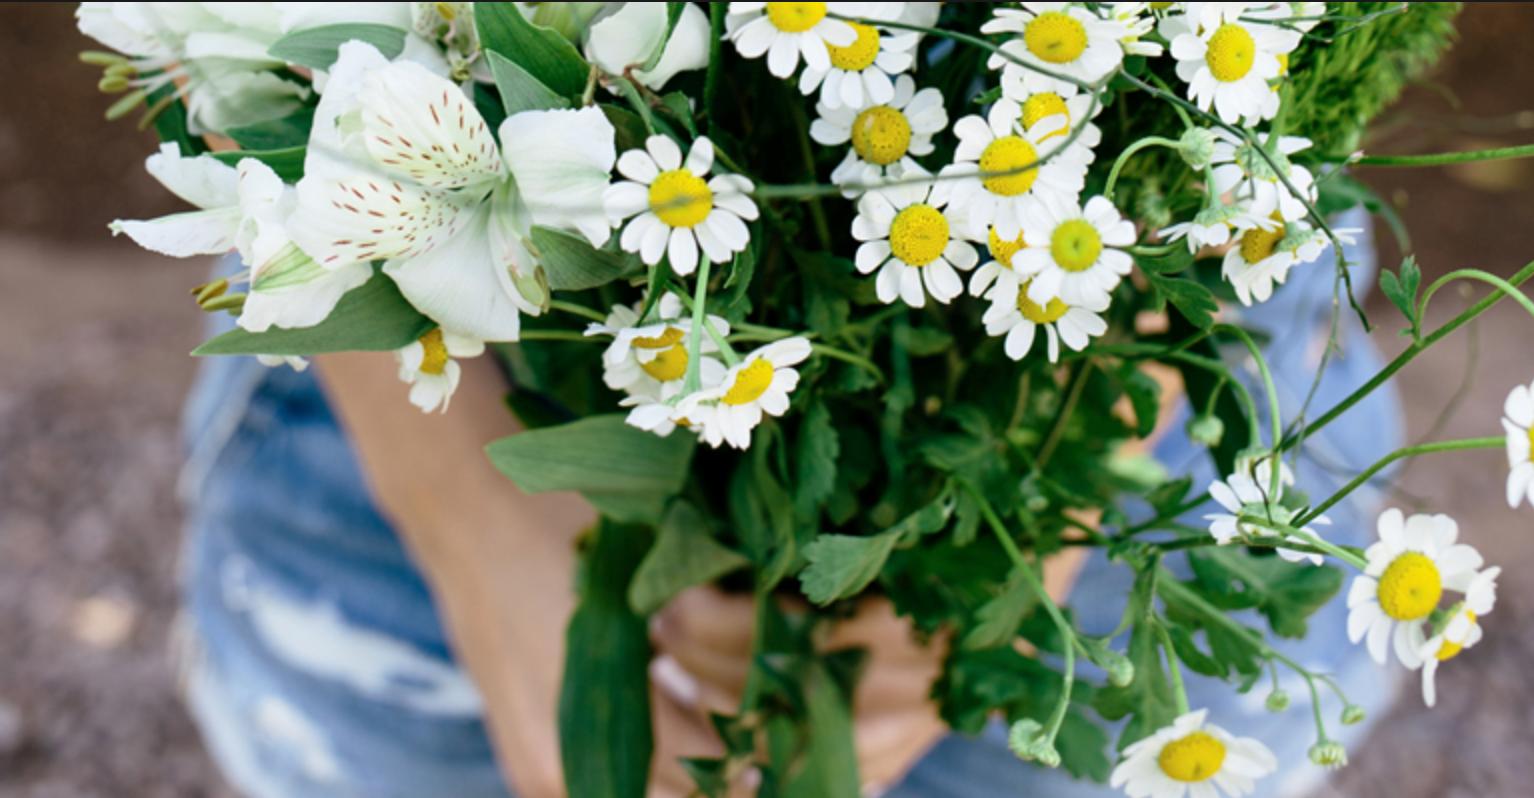 SPRING Self Care in Season Mini-Retreat for Women